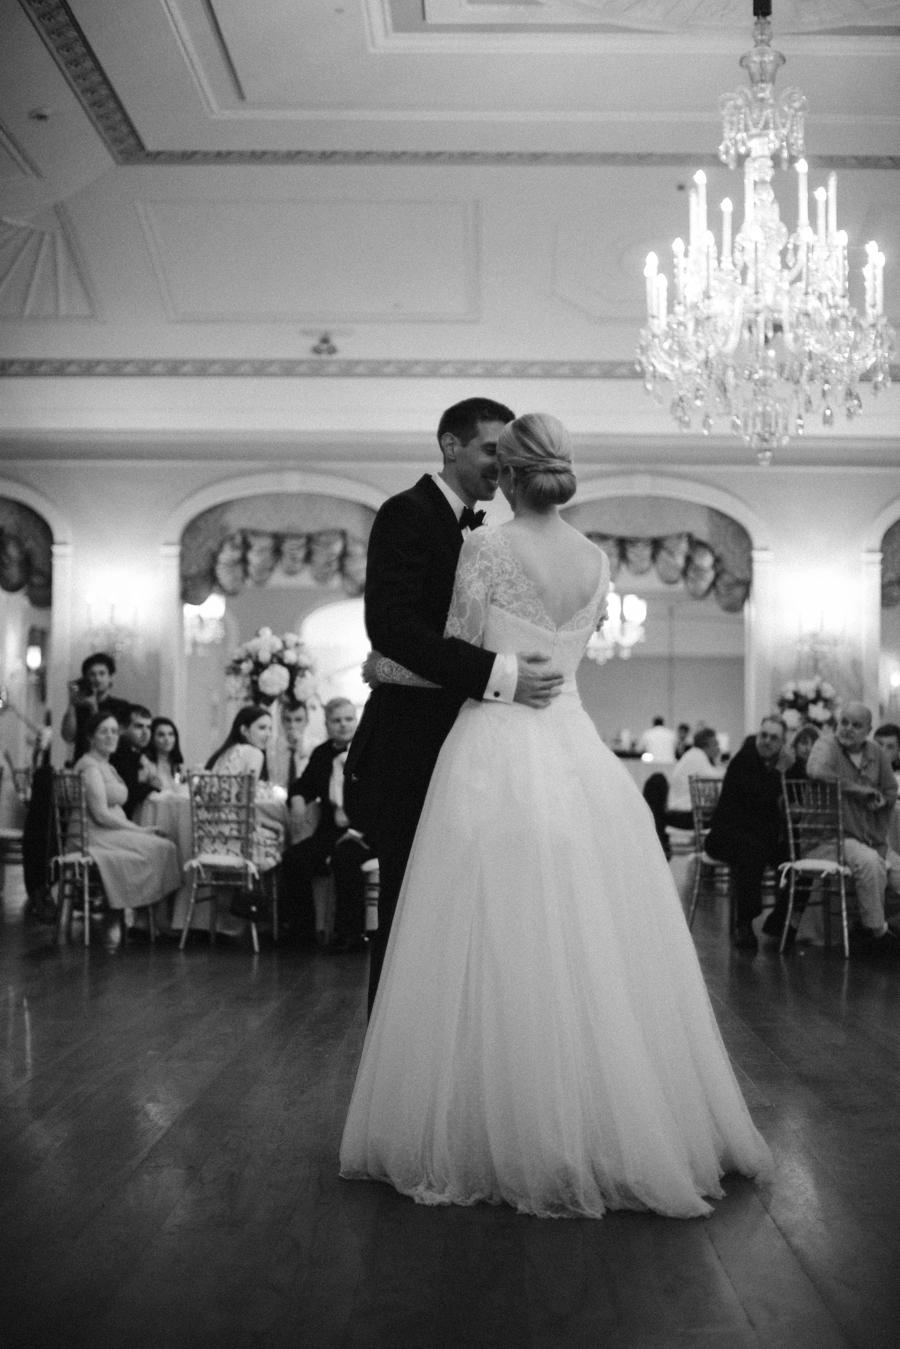 Henry_Ford__Lovett_Hall_Wedding_Detroit-54.jpg